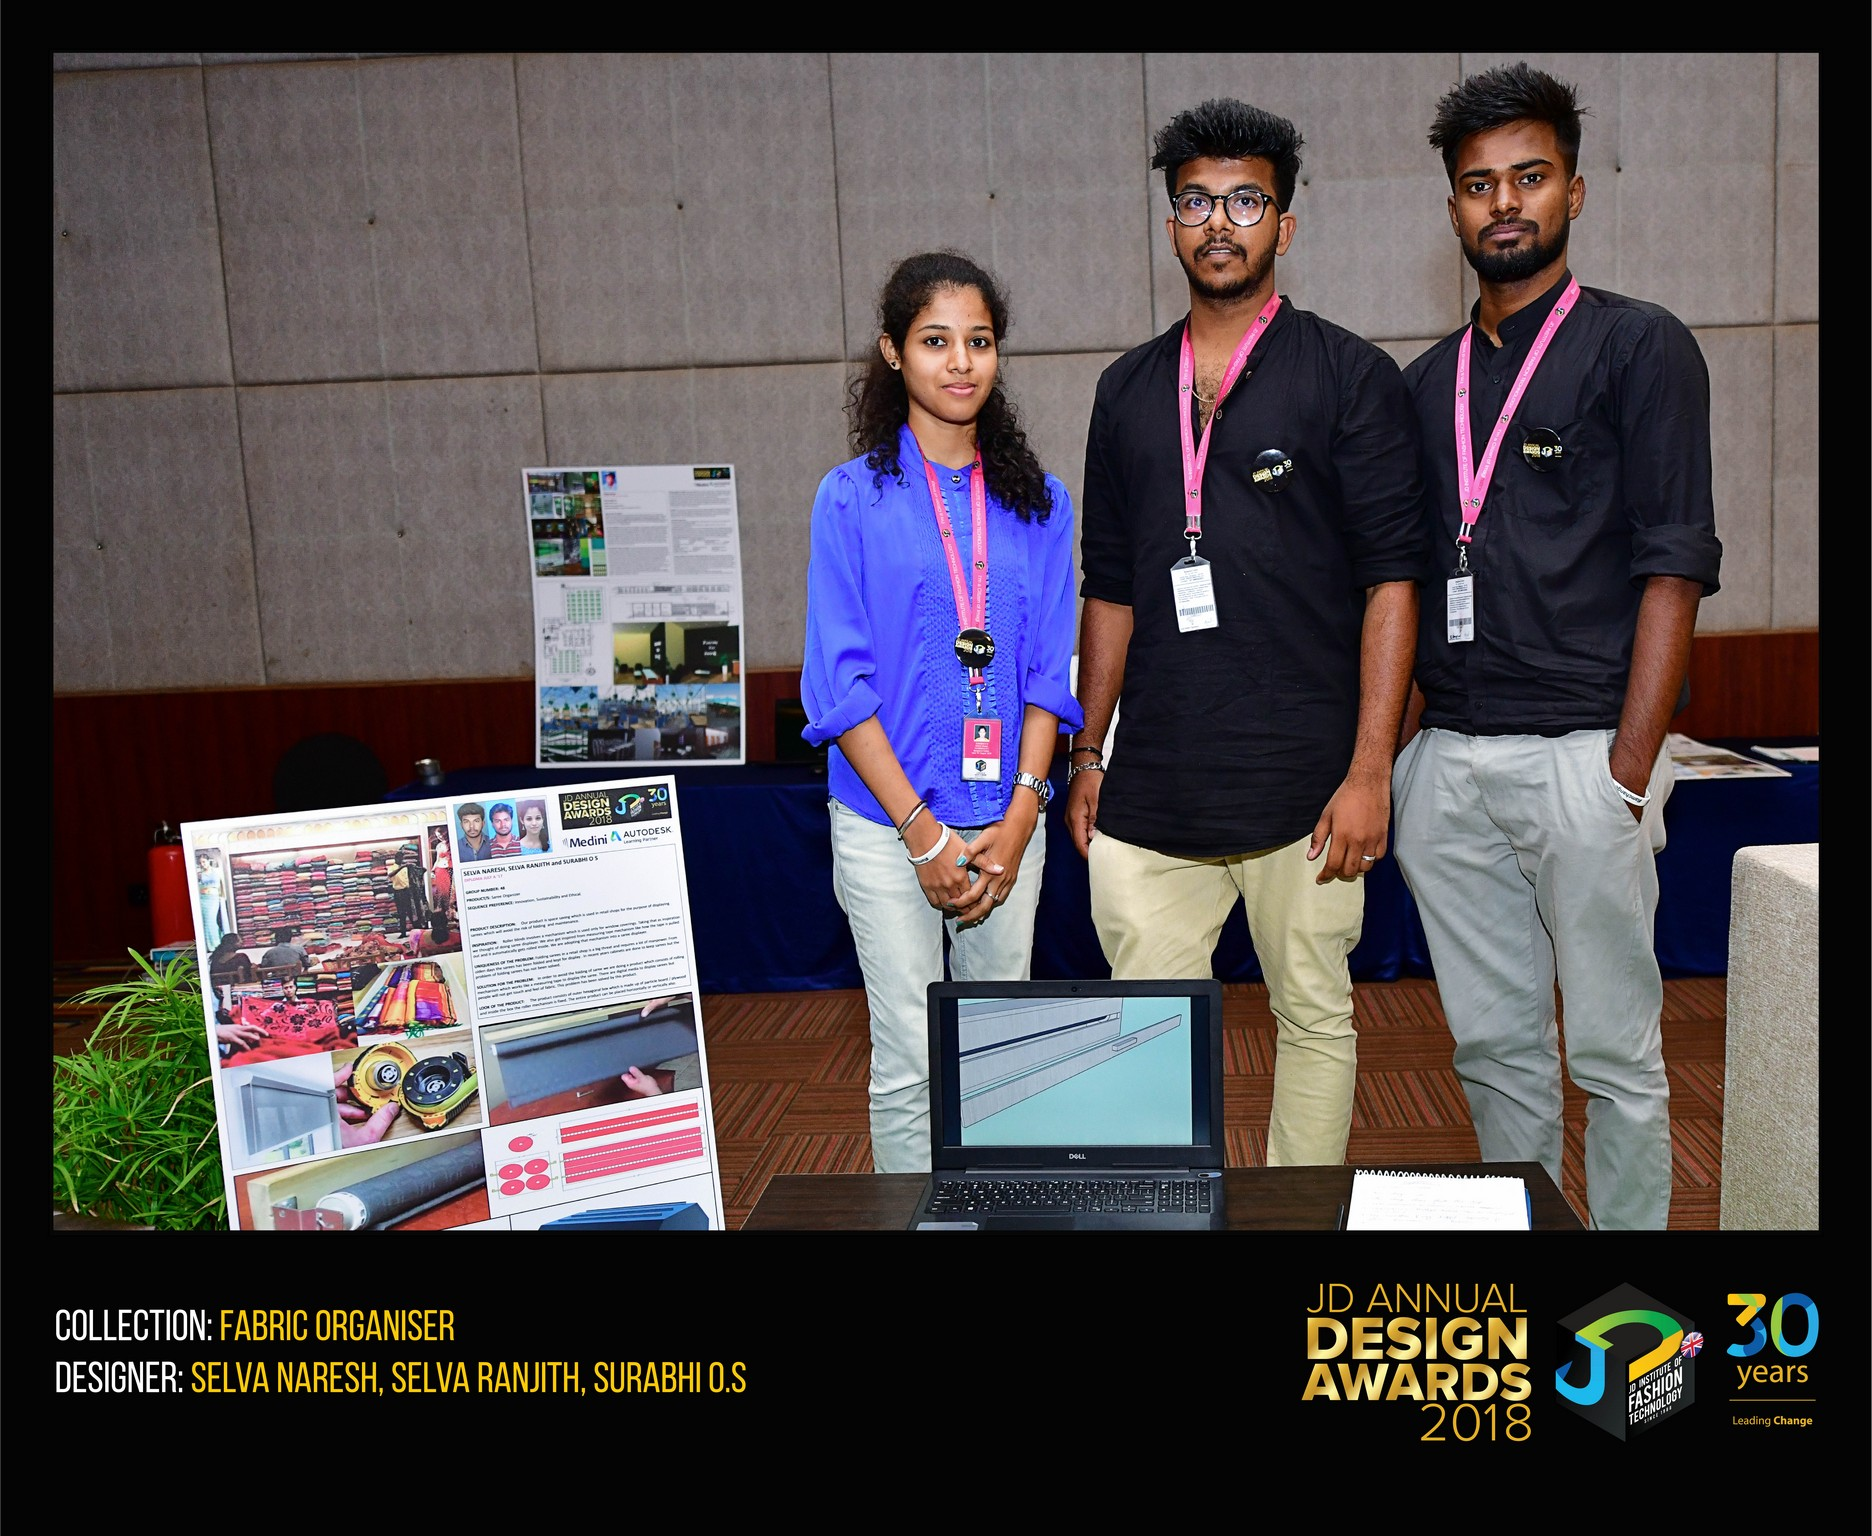 fabric organiser - fabric organiser - Fabric Organiser – Change – JD Annual Design Awards 2018